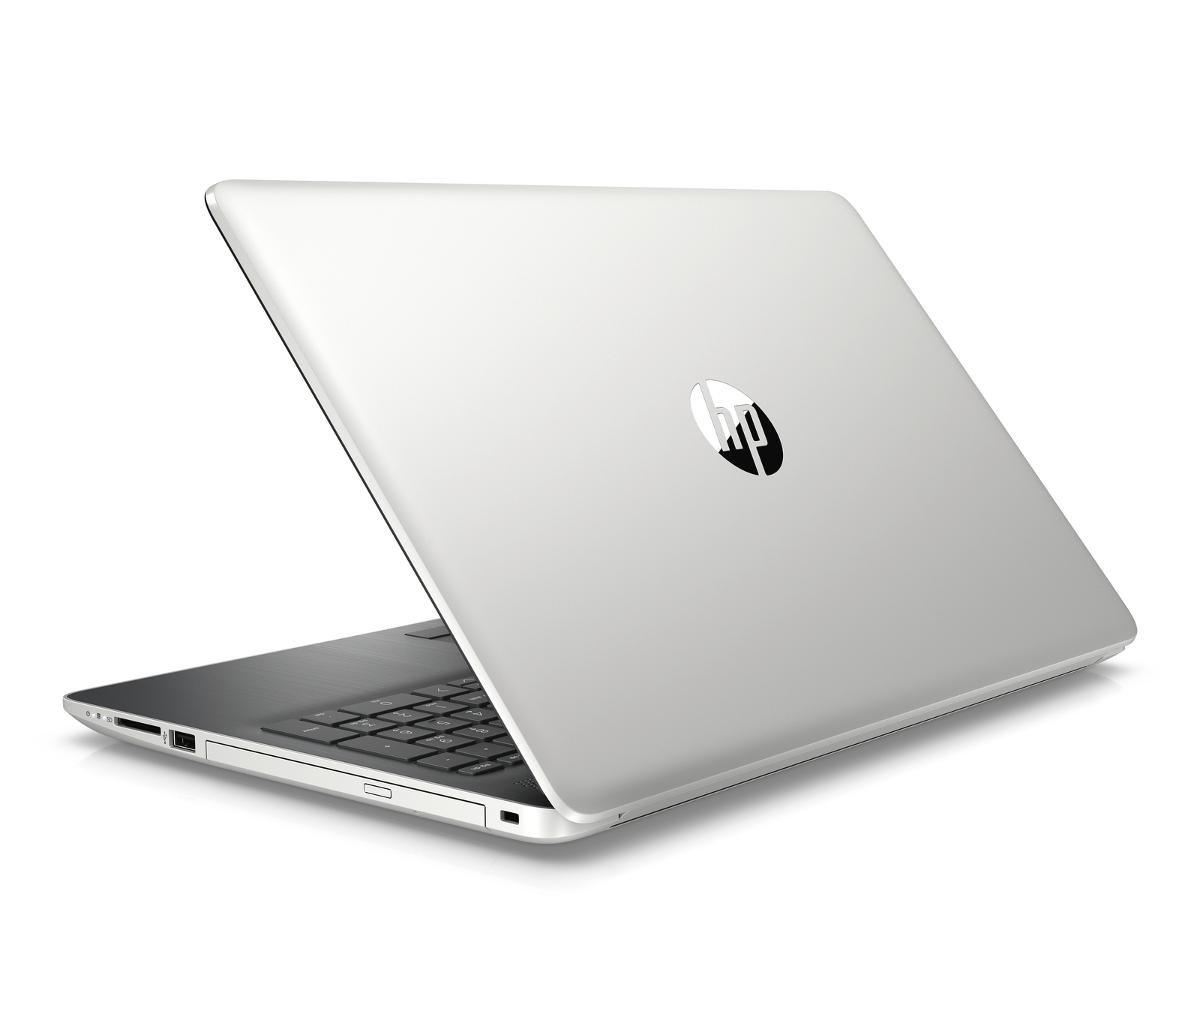 "Laptop HP 15-db1002nw 6VP68EA, Ryzen 5 3500U, 8 GB RAM, 15.6"", 256 GB, Windows 10 Home"